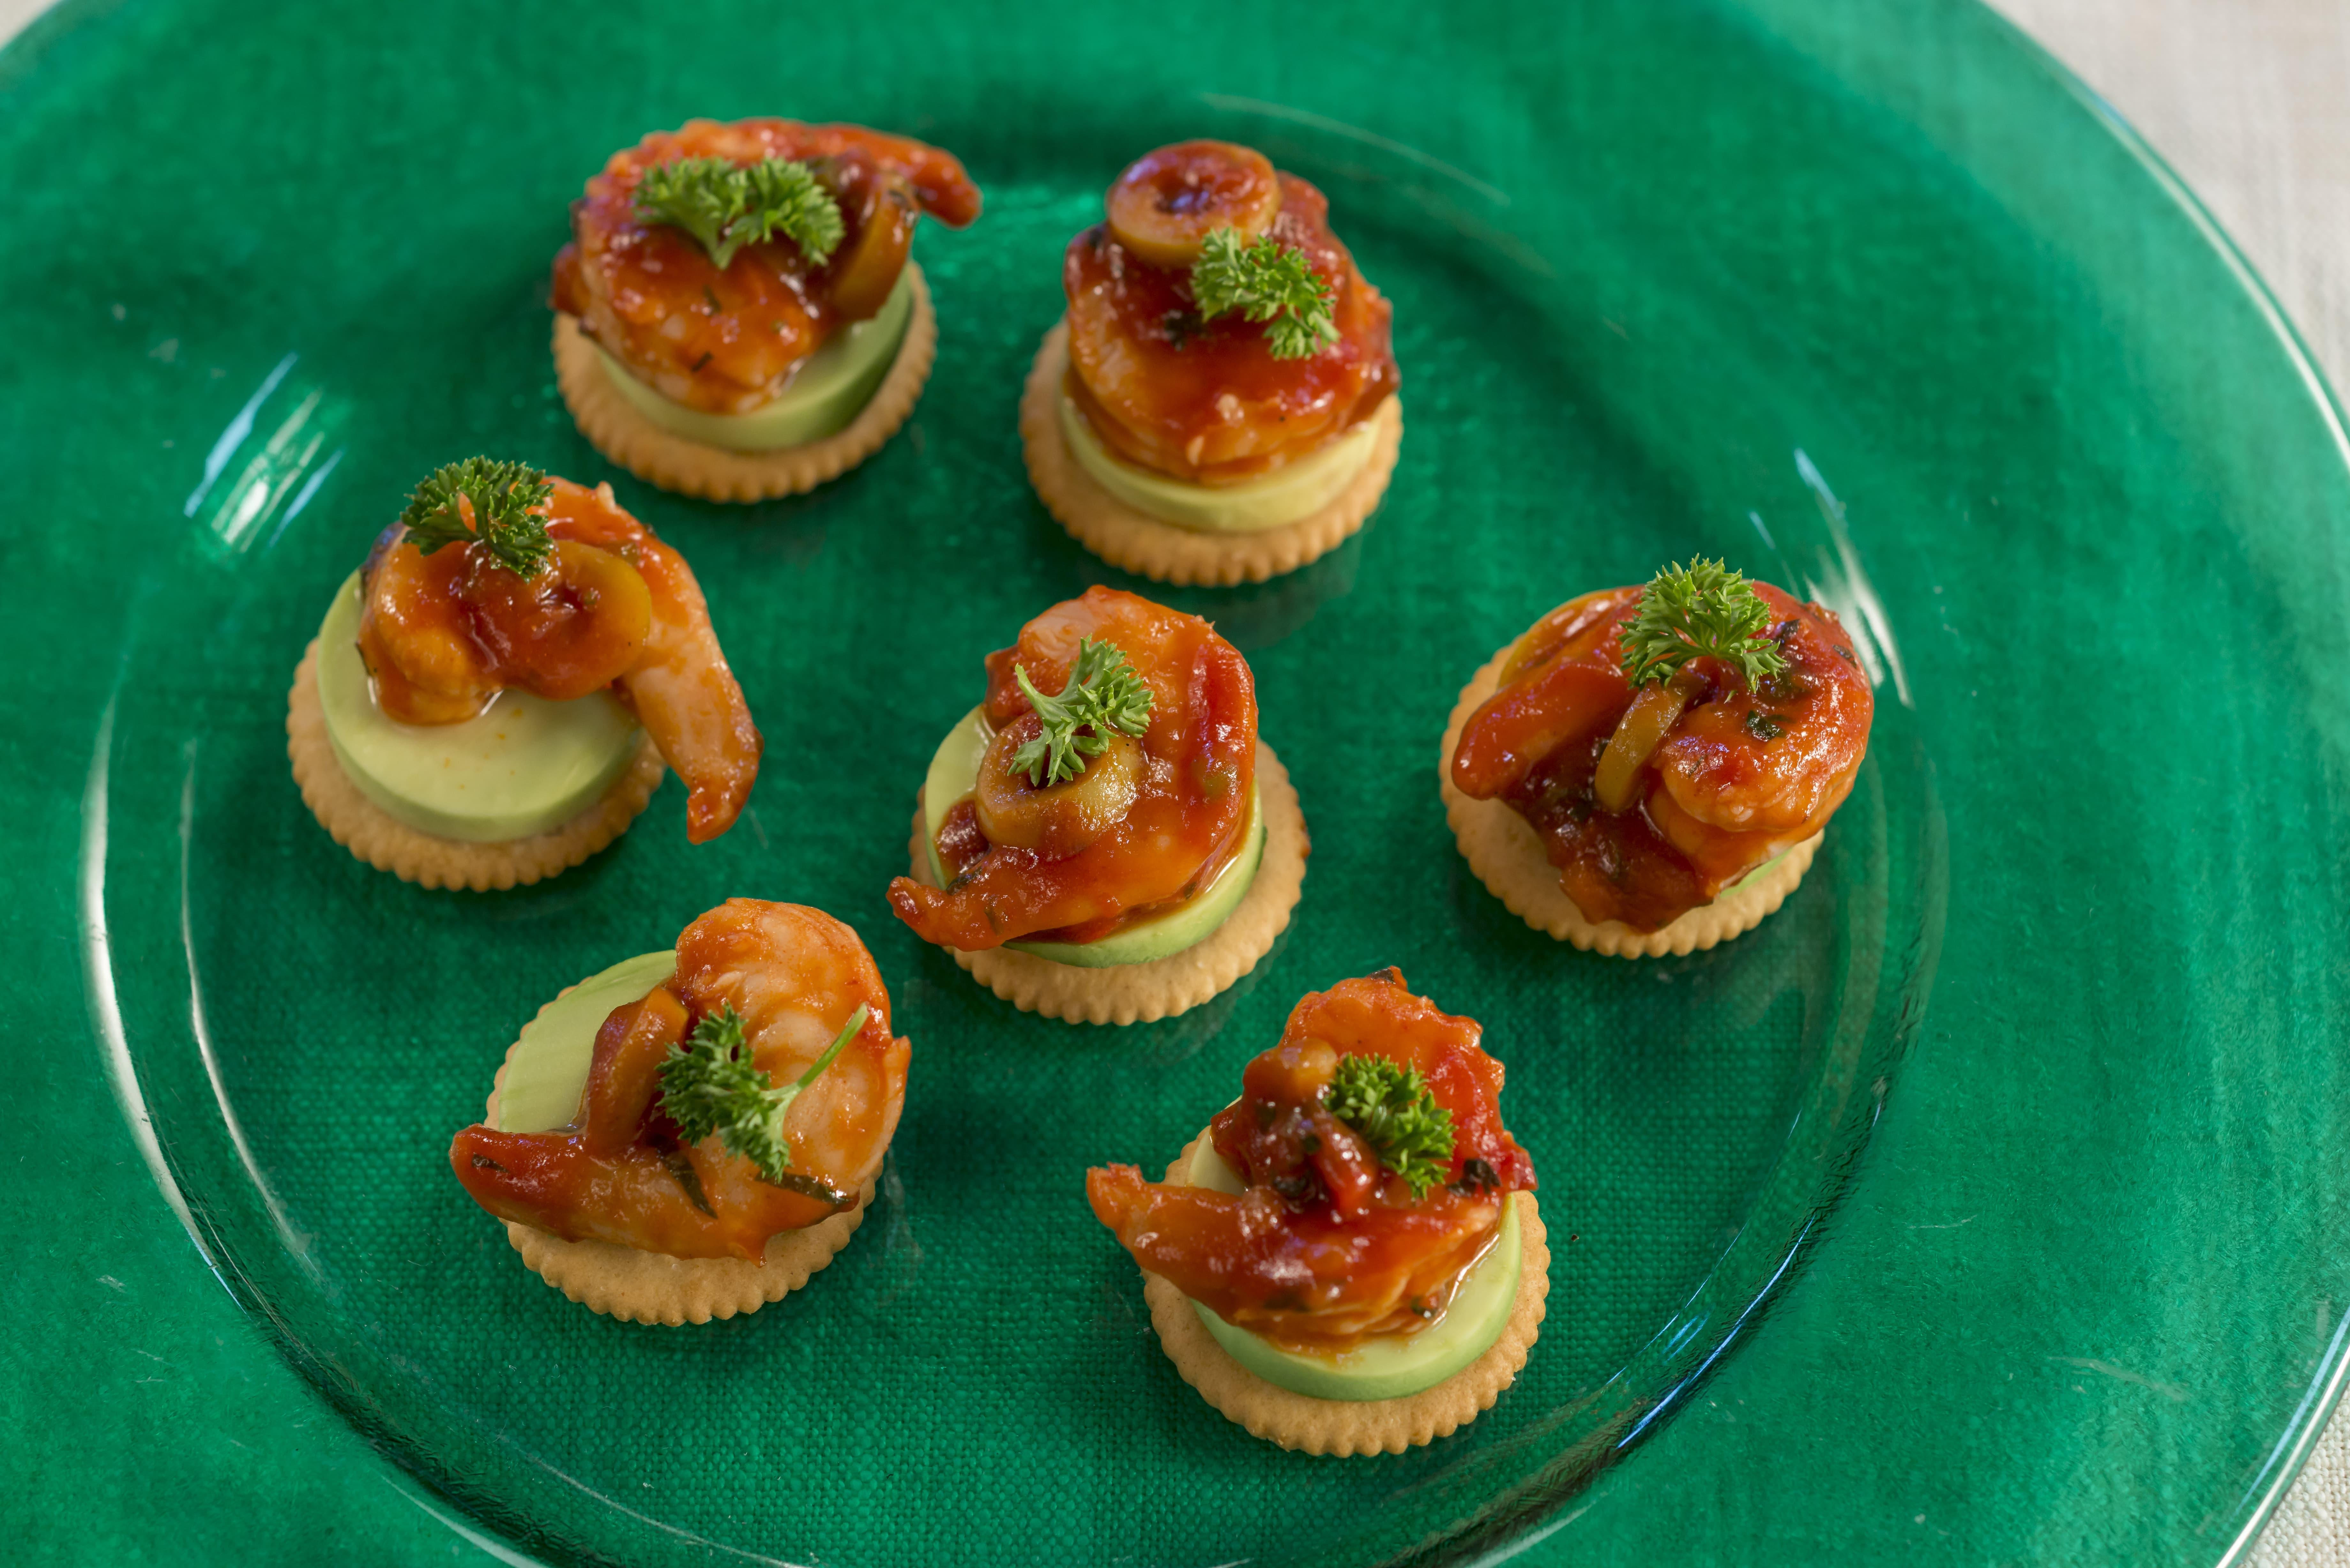 Bocaditos de camarón en salsa de tomate